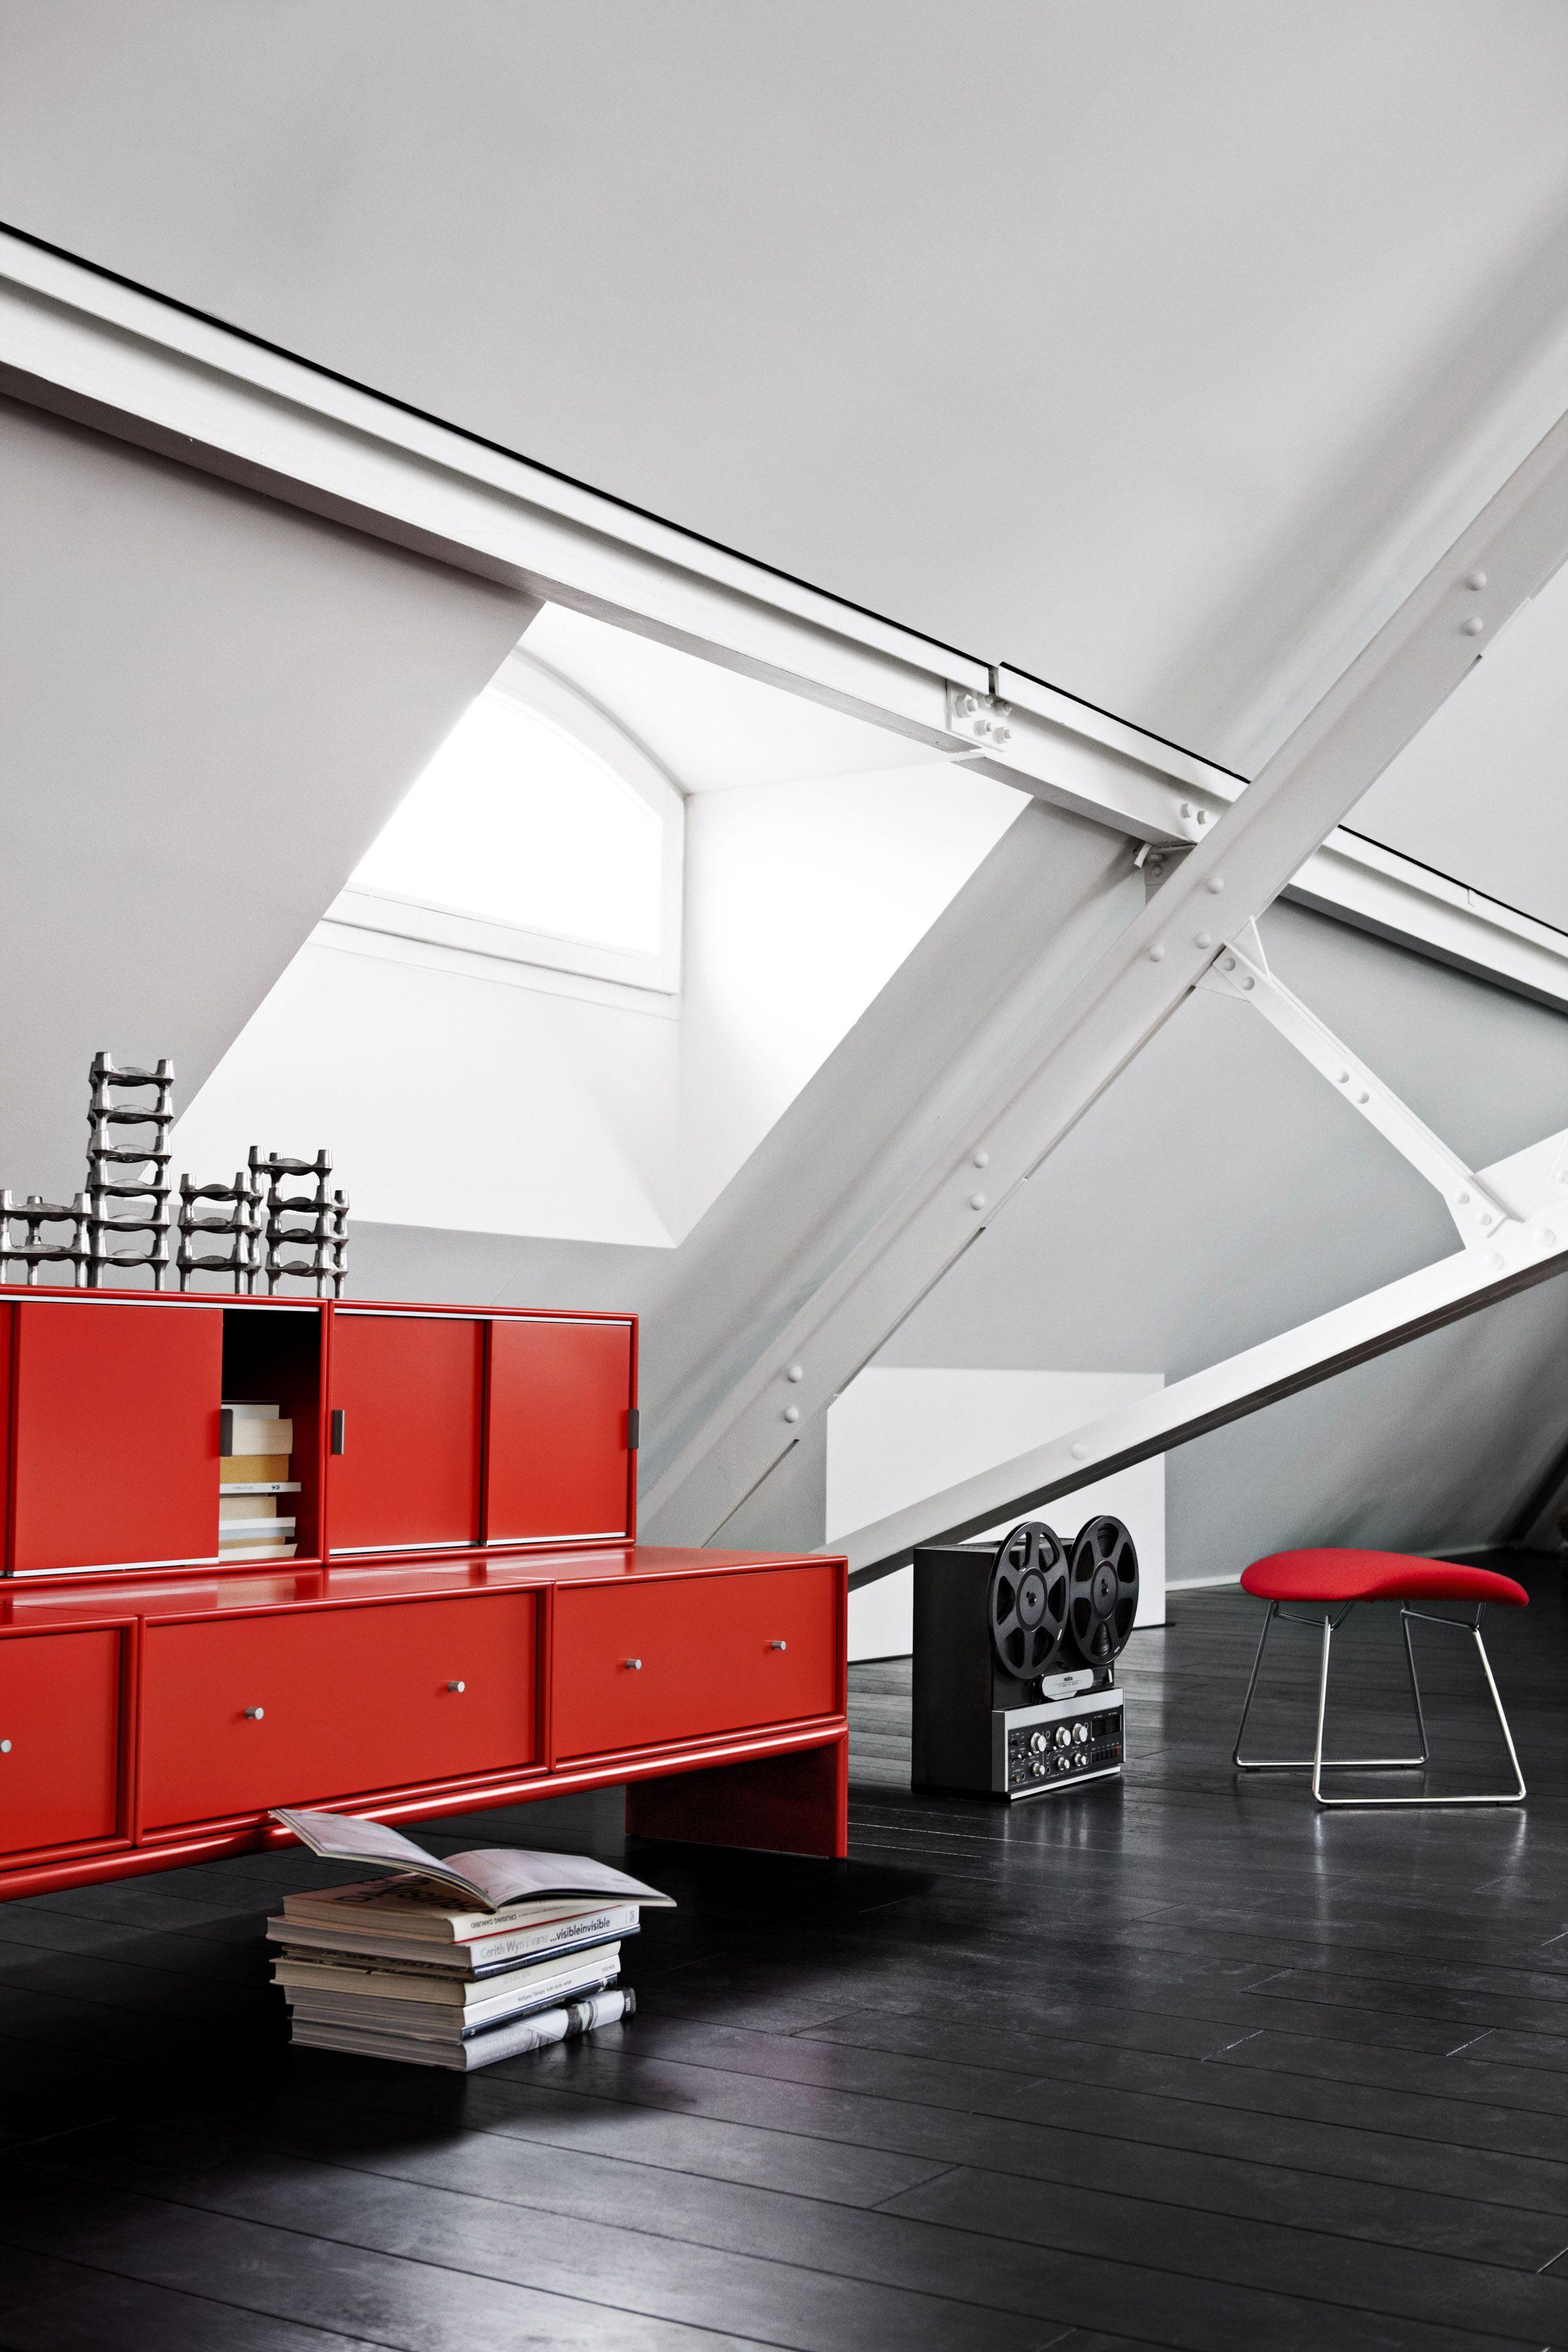 red cabinets in cool new yorker loft. #montana #furniture #danish ... - Danish Design Wohnzimmer